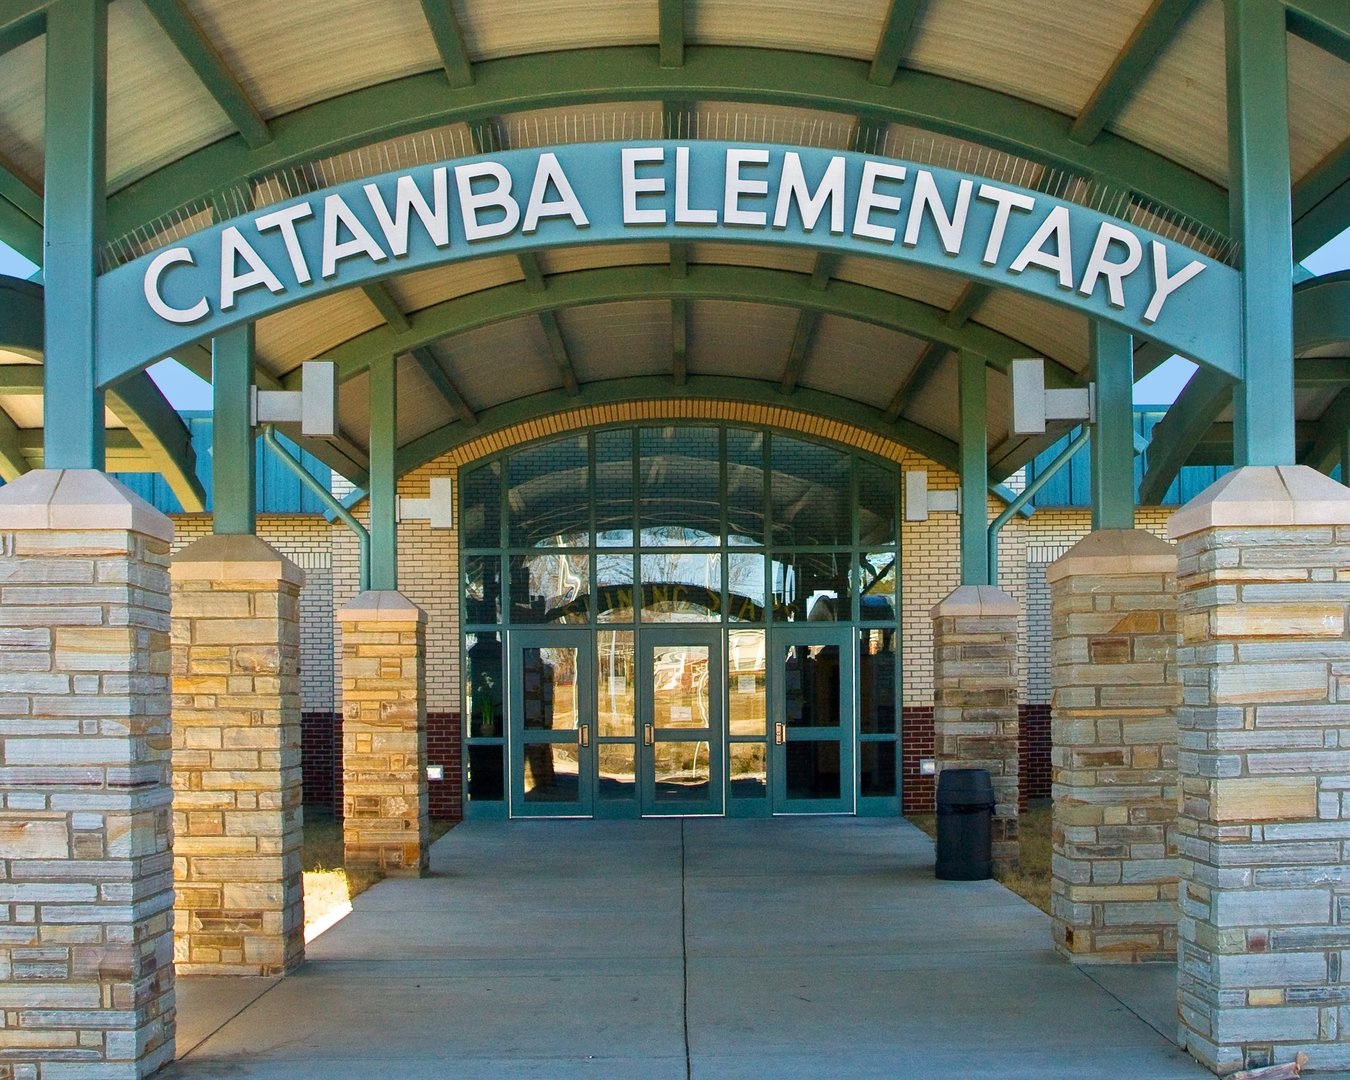 Catawba Elementary